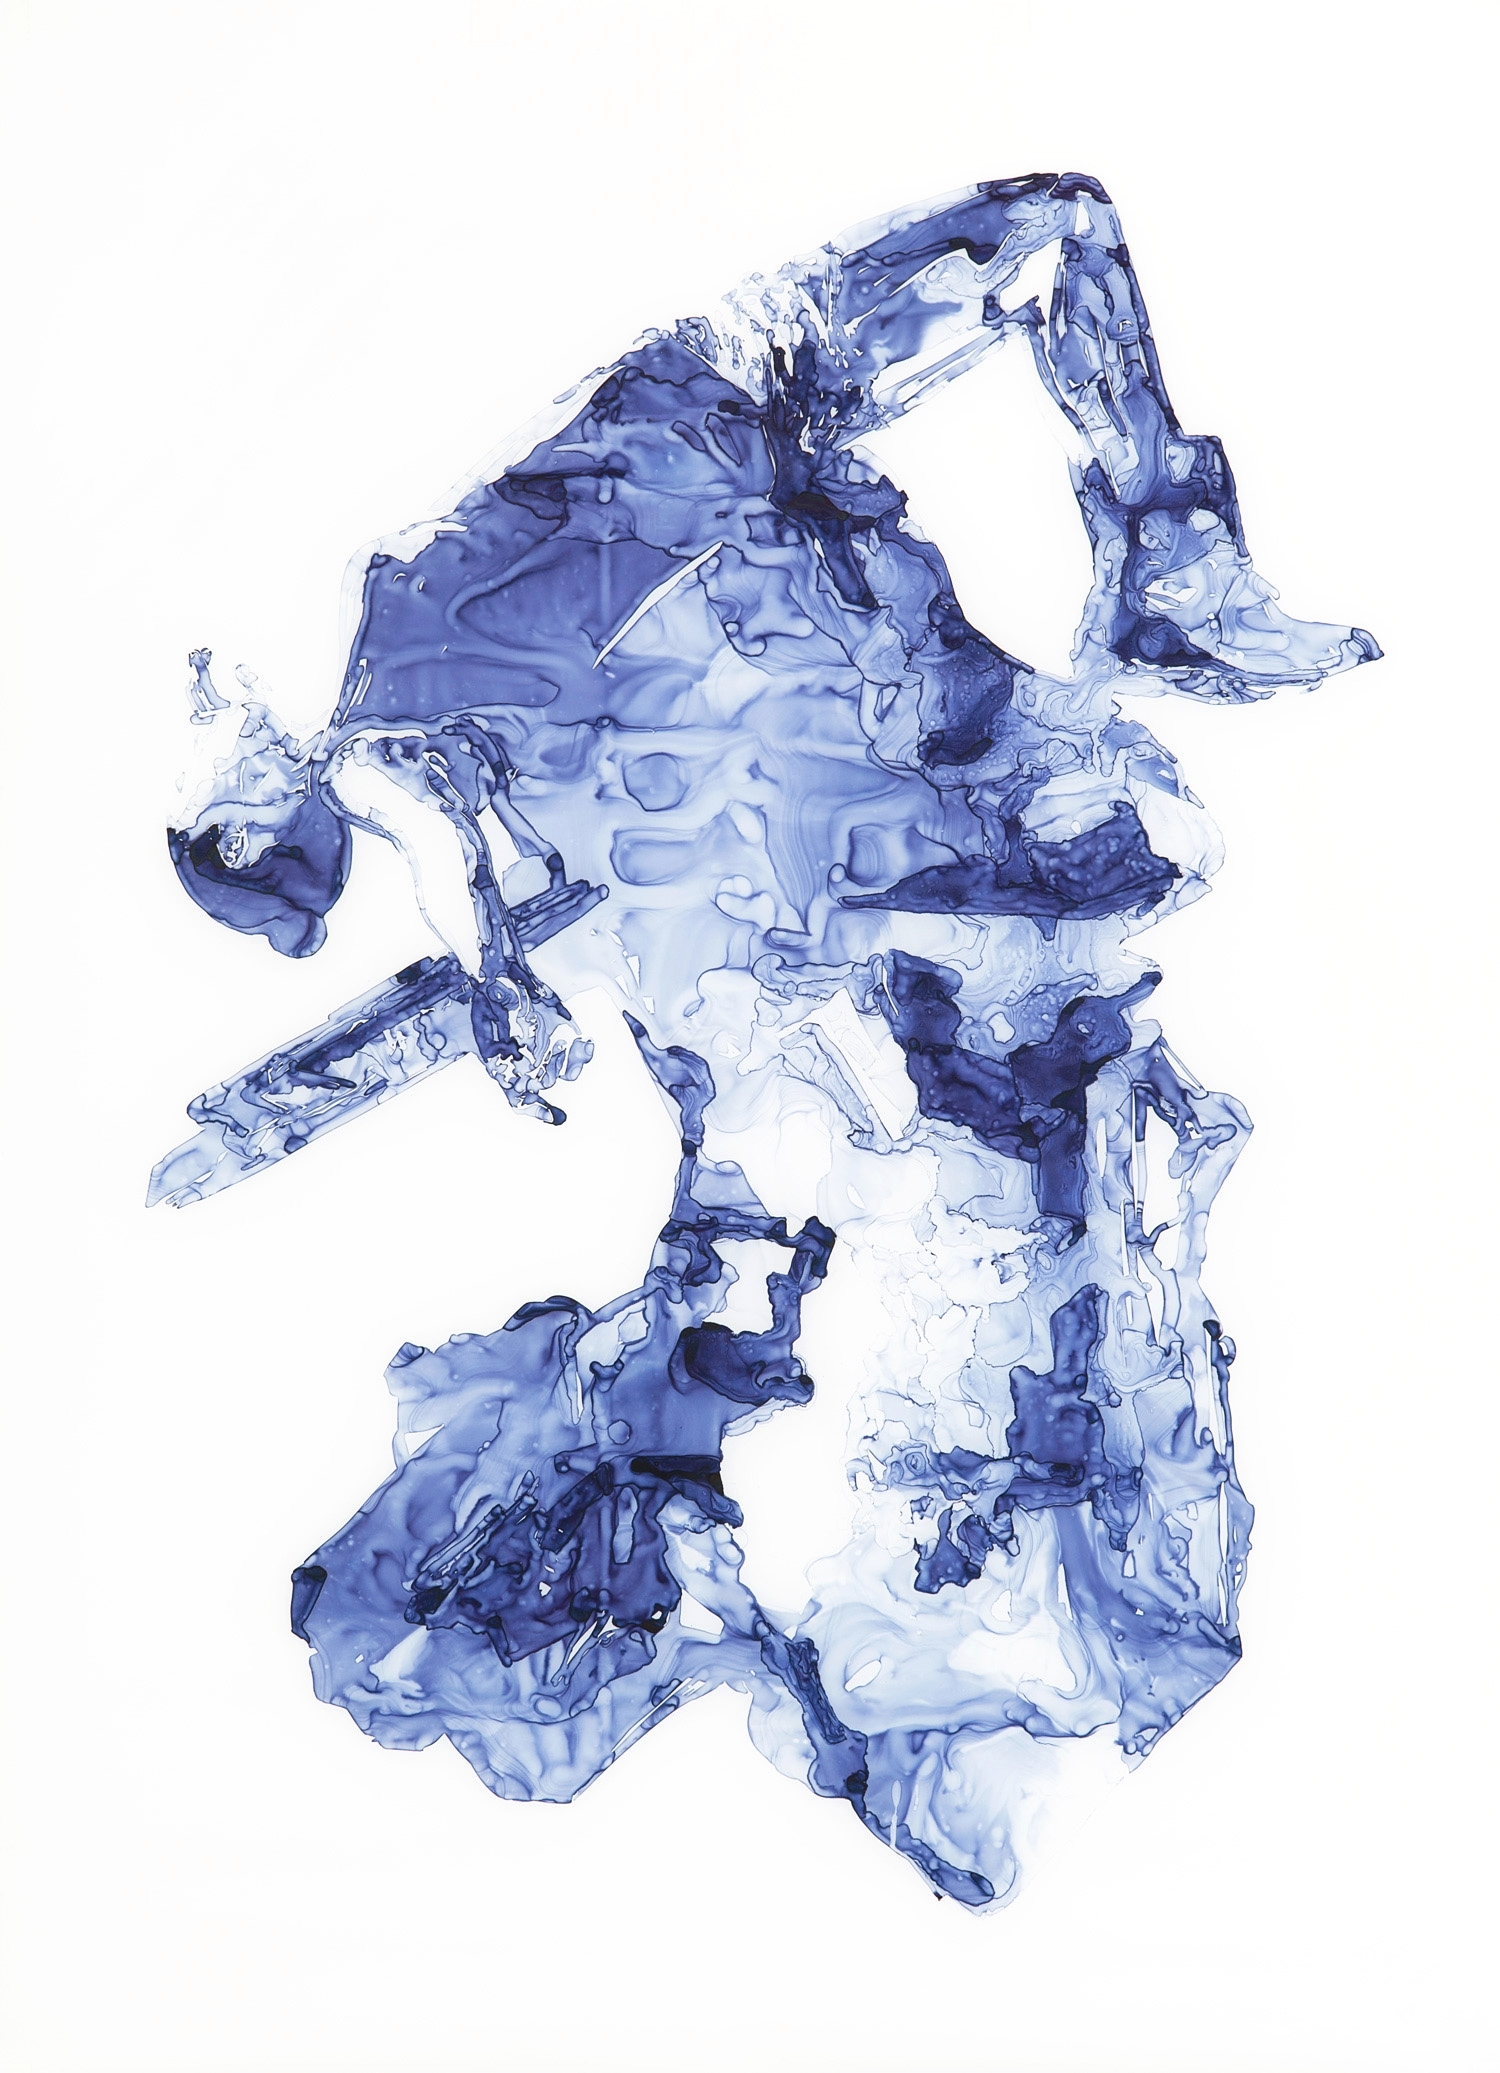 Gypsum  2012 Ink on drafting film, 84 x 60 inches